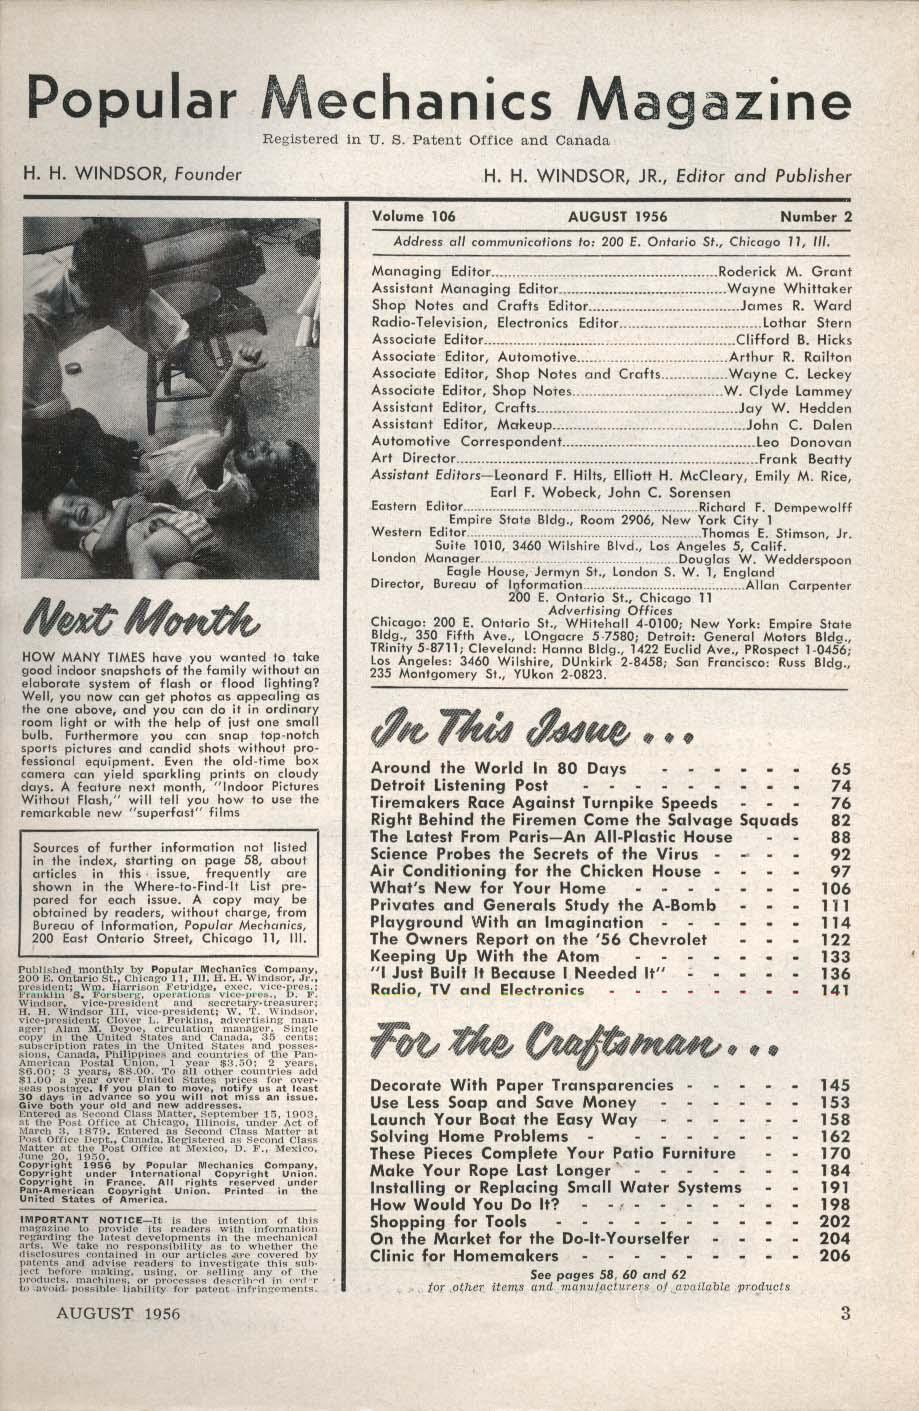 Image for POPULAR MECHANICS Chevrolet Test Indian Crafstmen Television Cameras ++ 8 1956